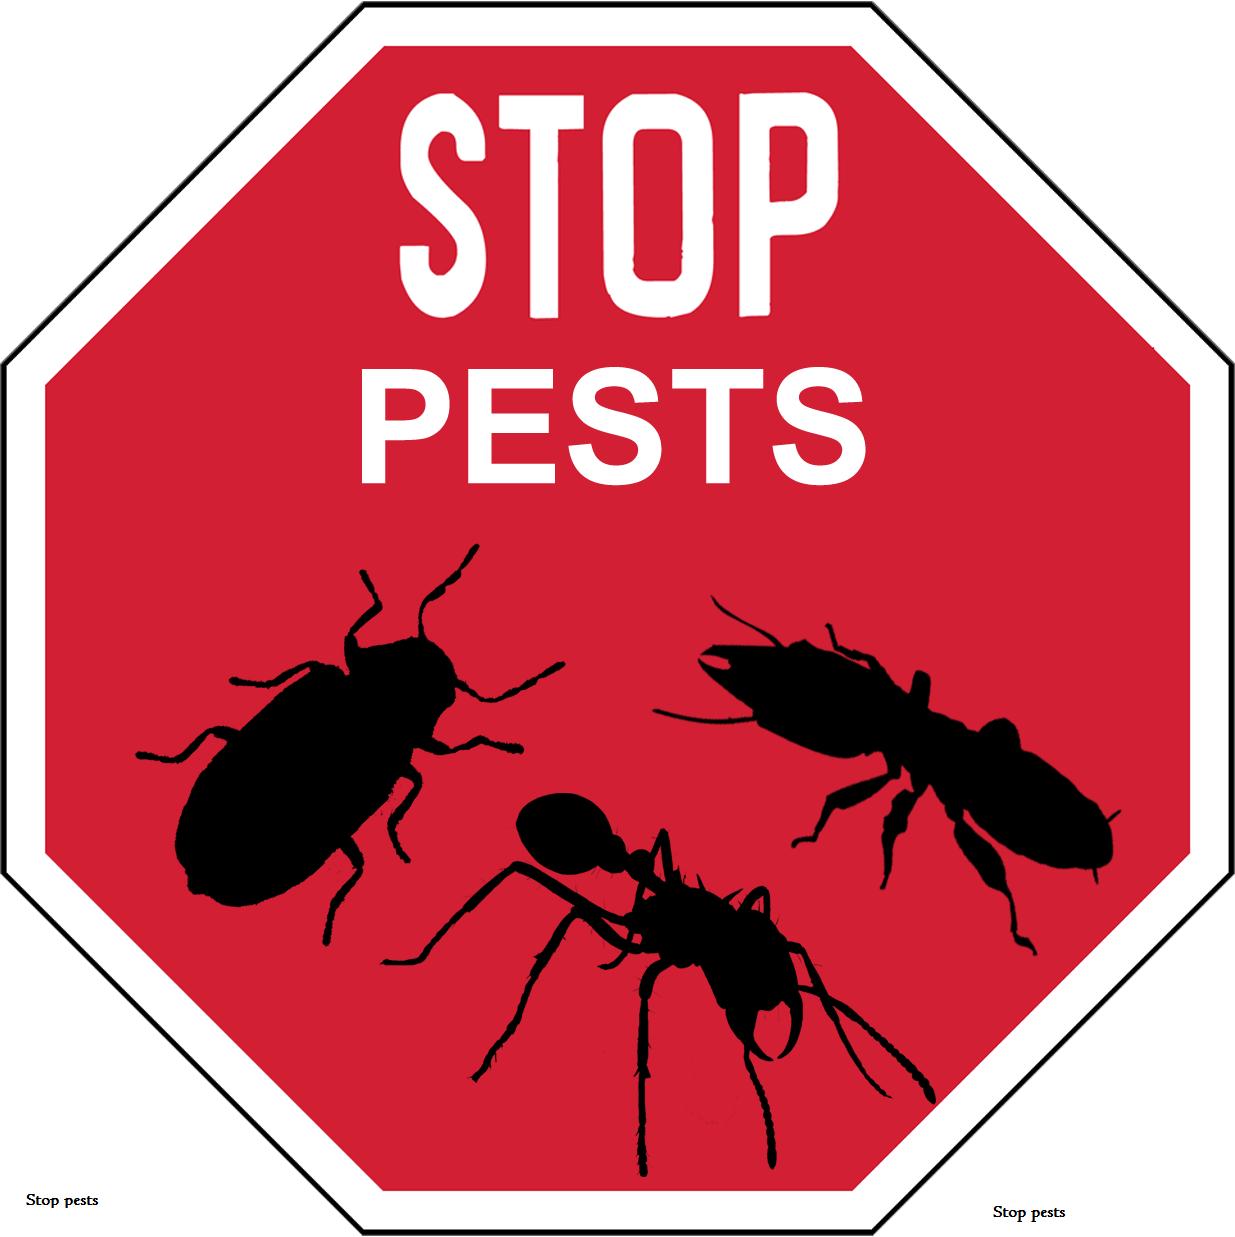 to Jopestkil Kenya's focused pest control in